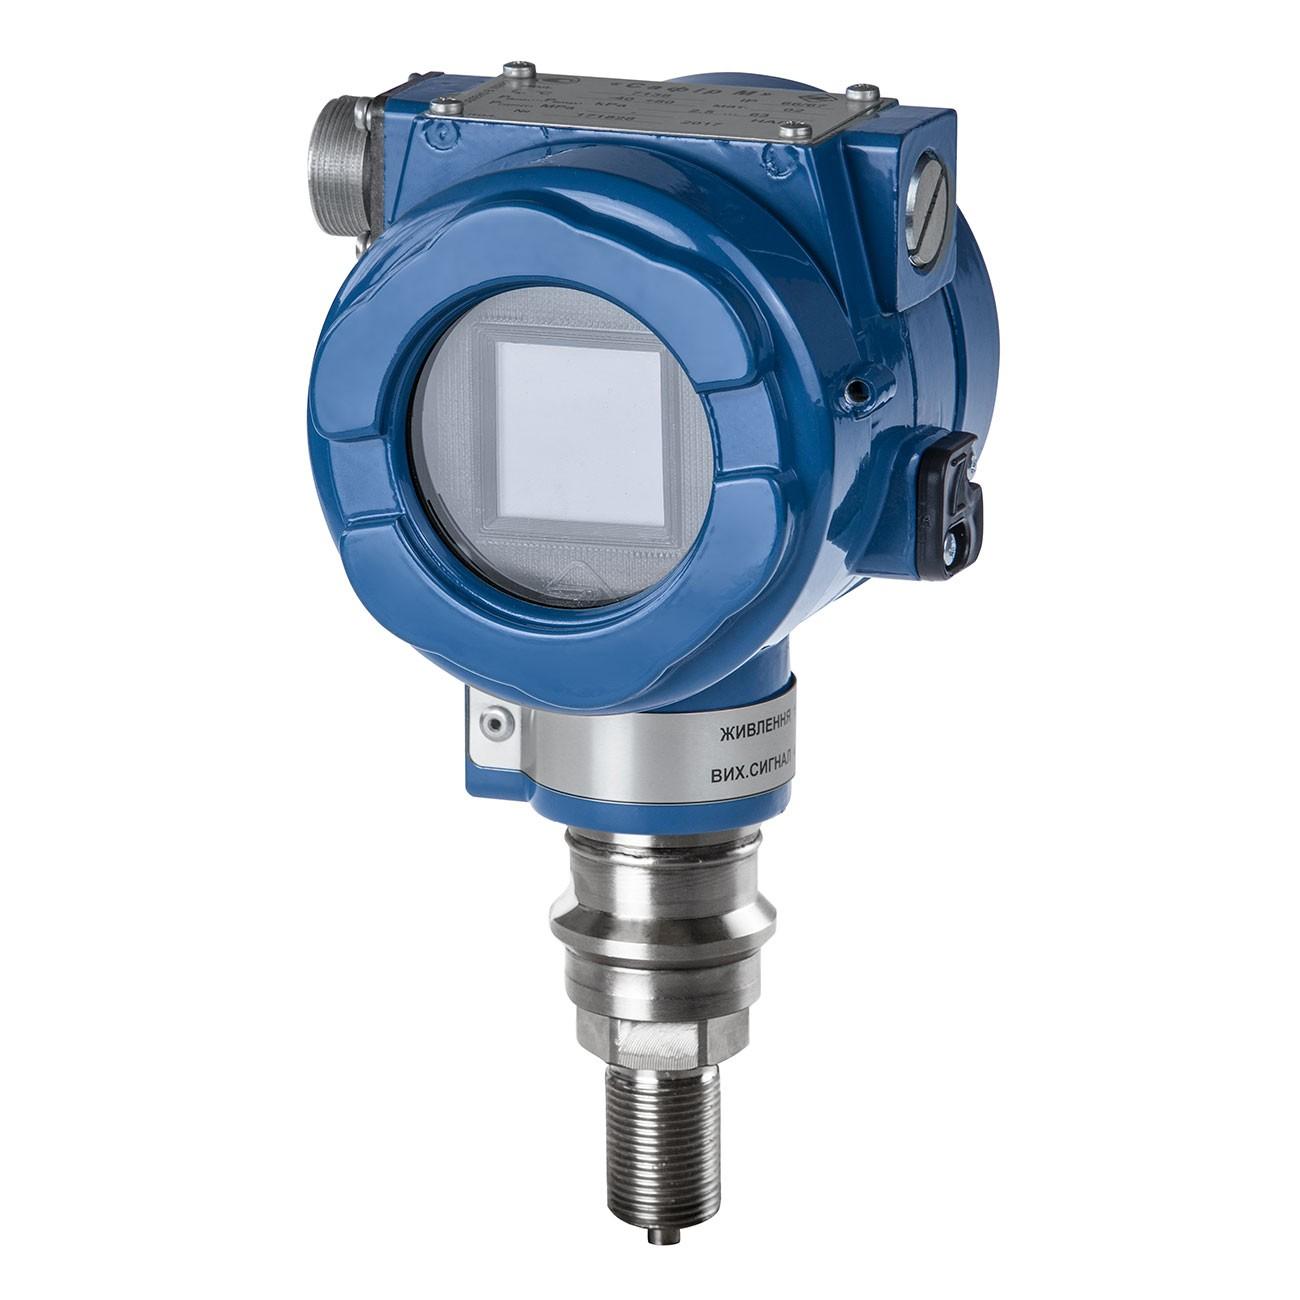 Smart Absolute pressure transmitters Safir-M 5030, 5040, 5050